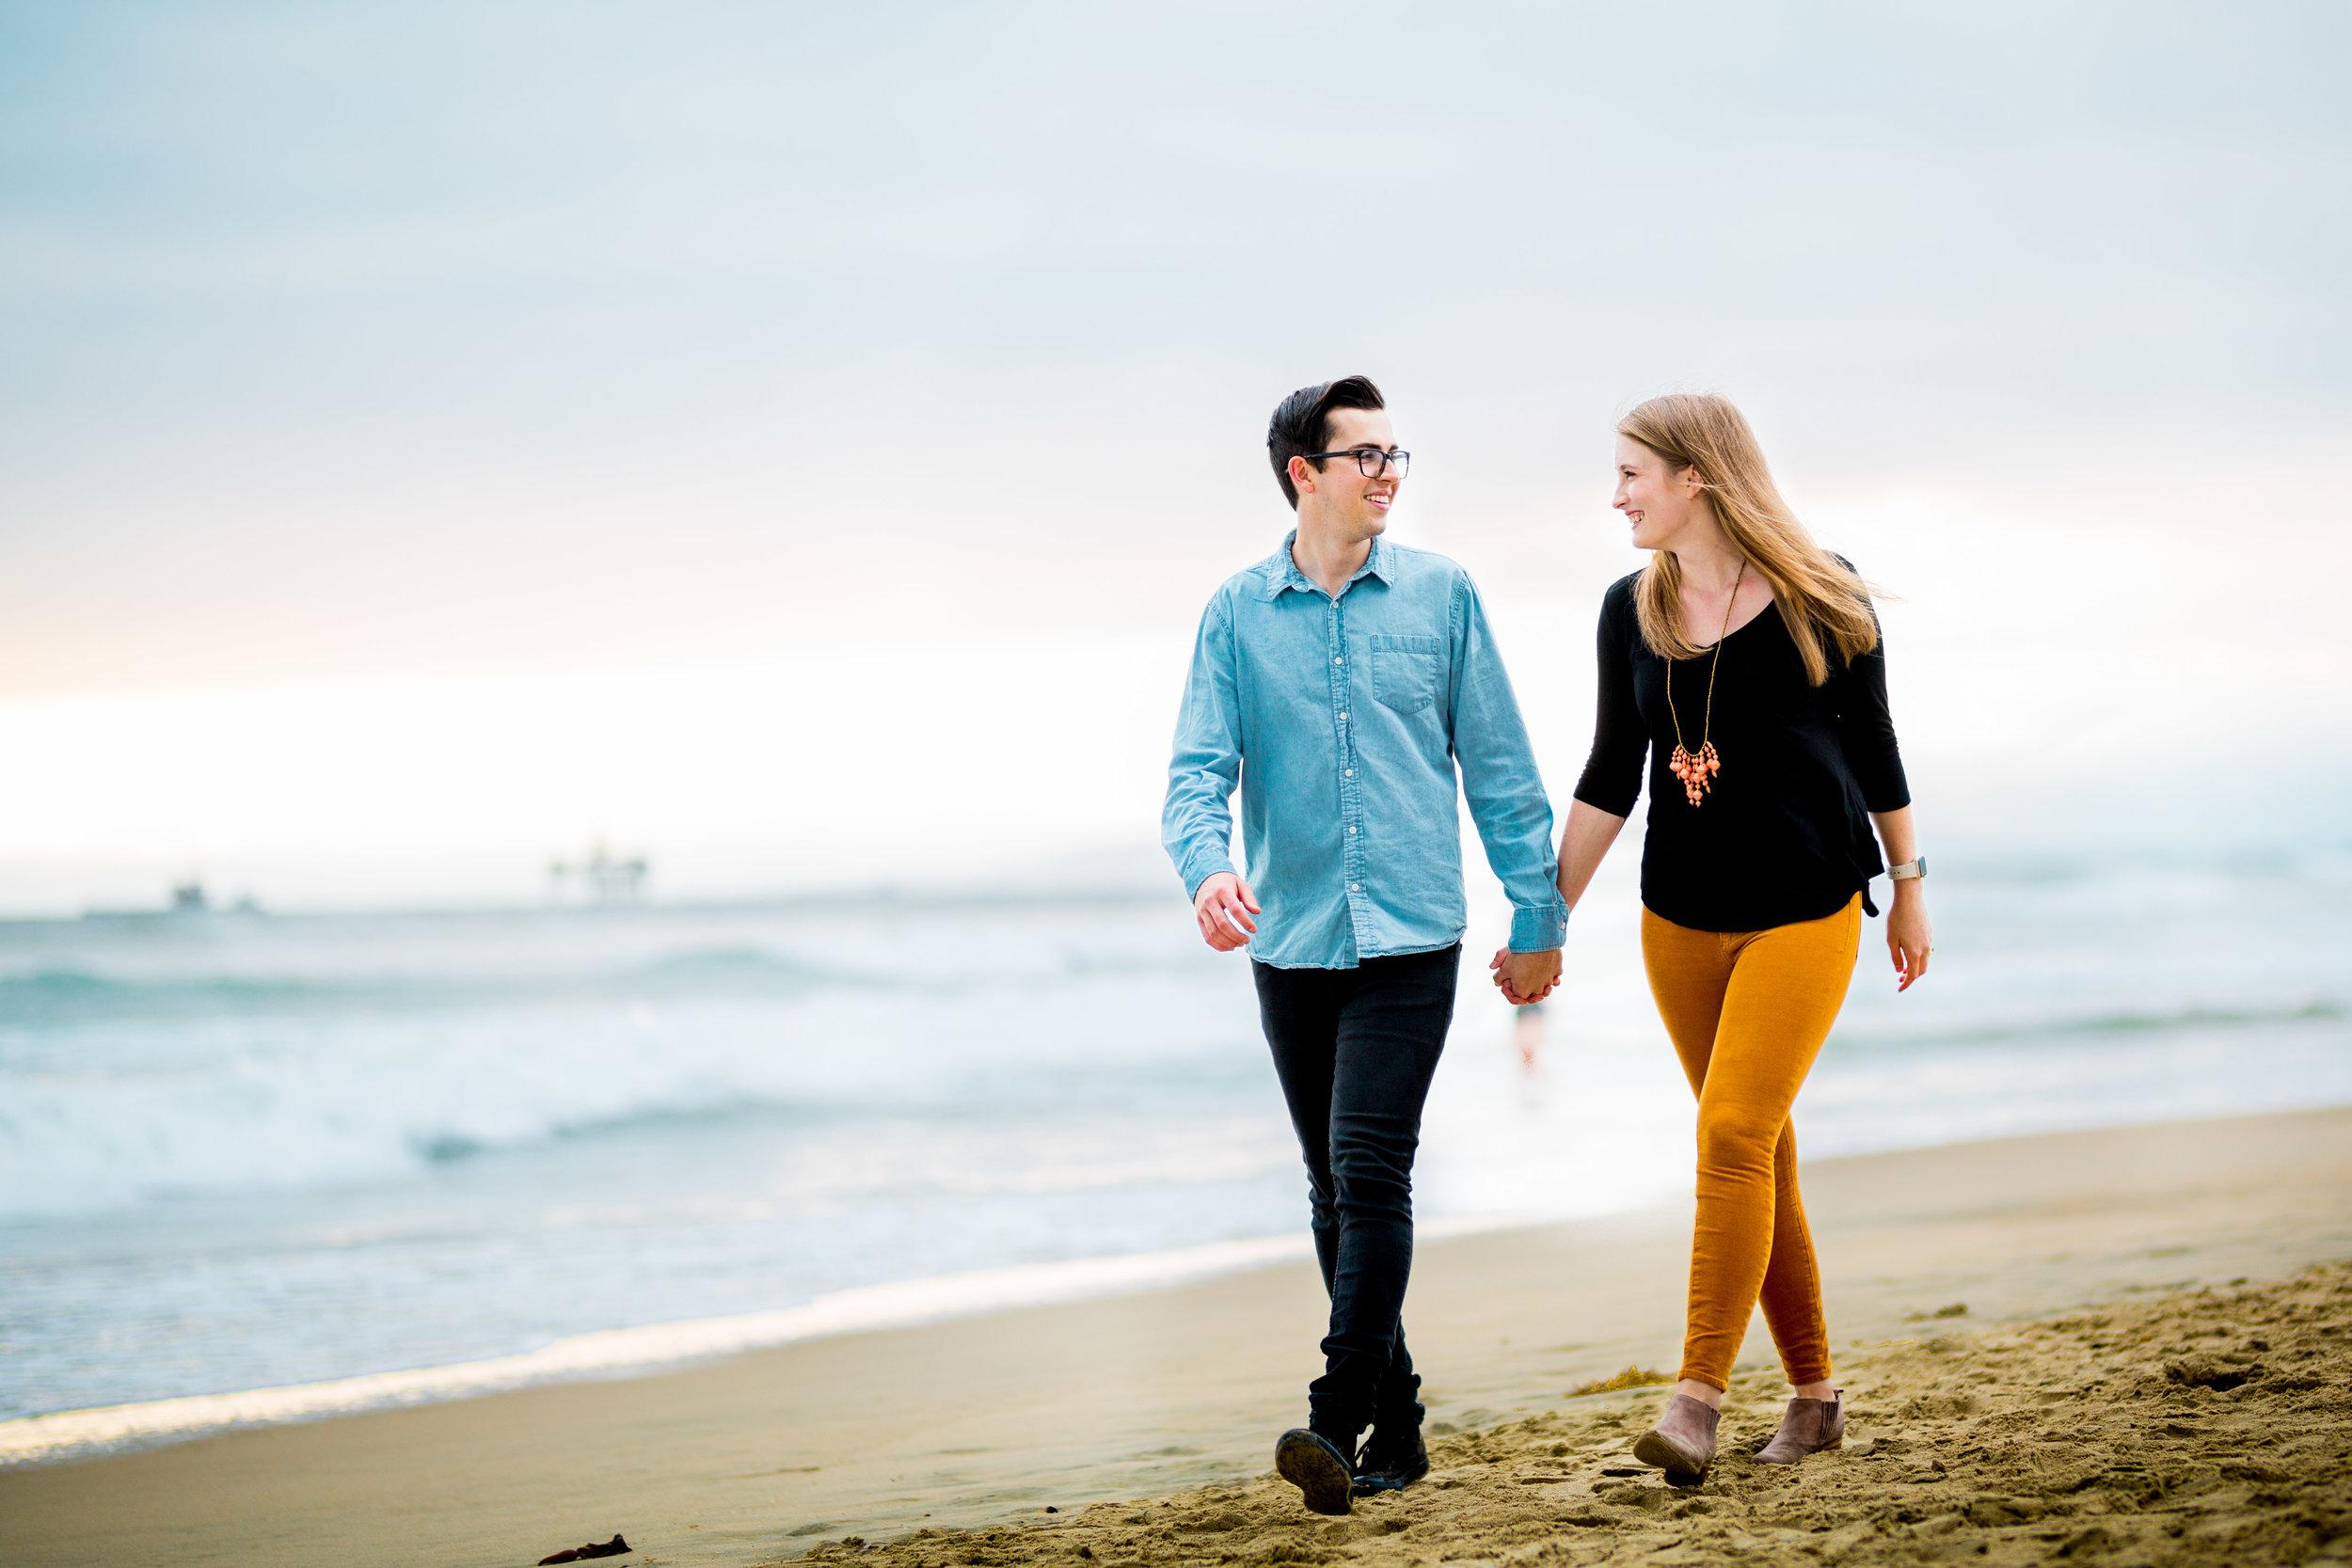 Huntington Beach Orange County Southern California Romantic Fun Rustic Elegant Wedding Engagement Photographer Photography by Glass Woods Media 1.jpg